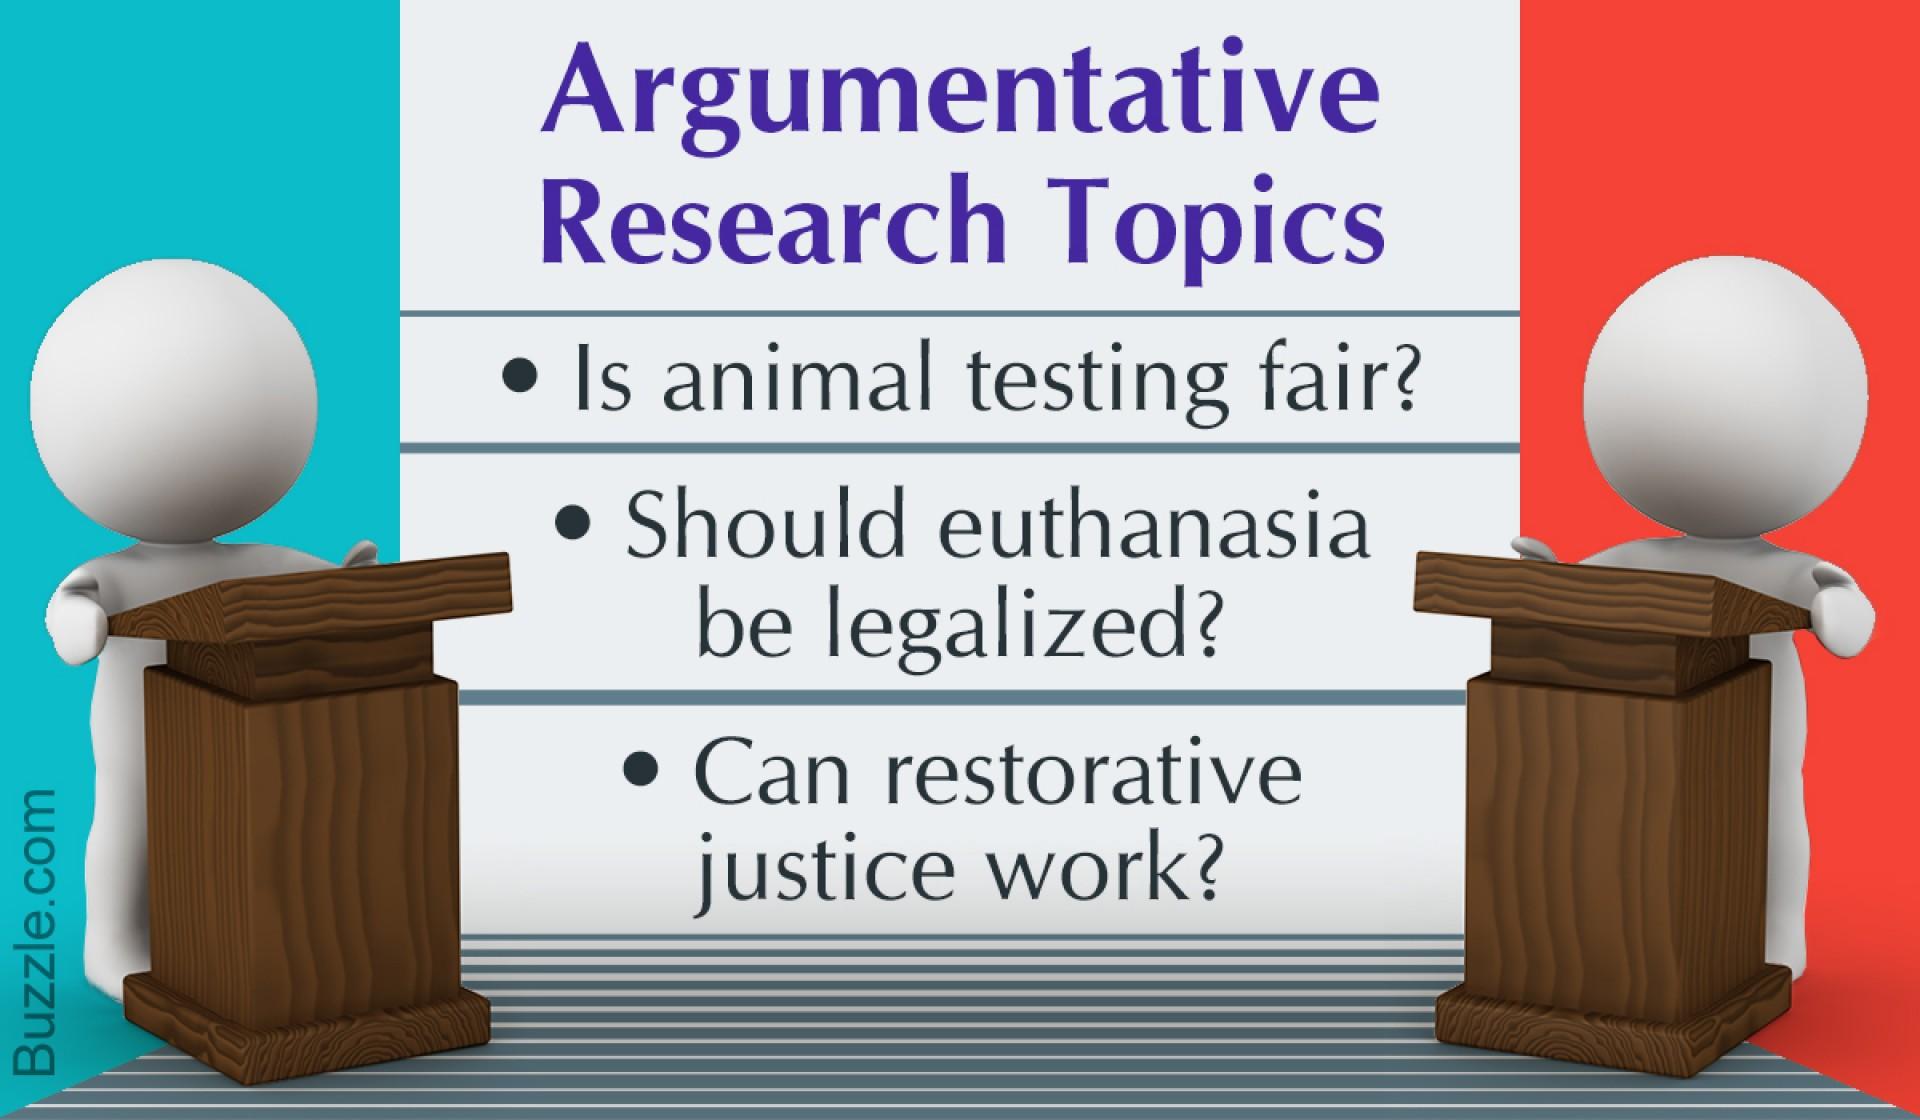 001 Controversial Argumentative Essay Topics Excellent Non Current 1920